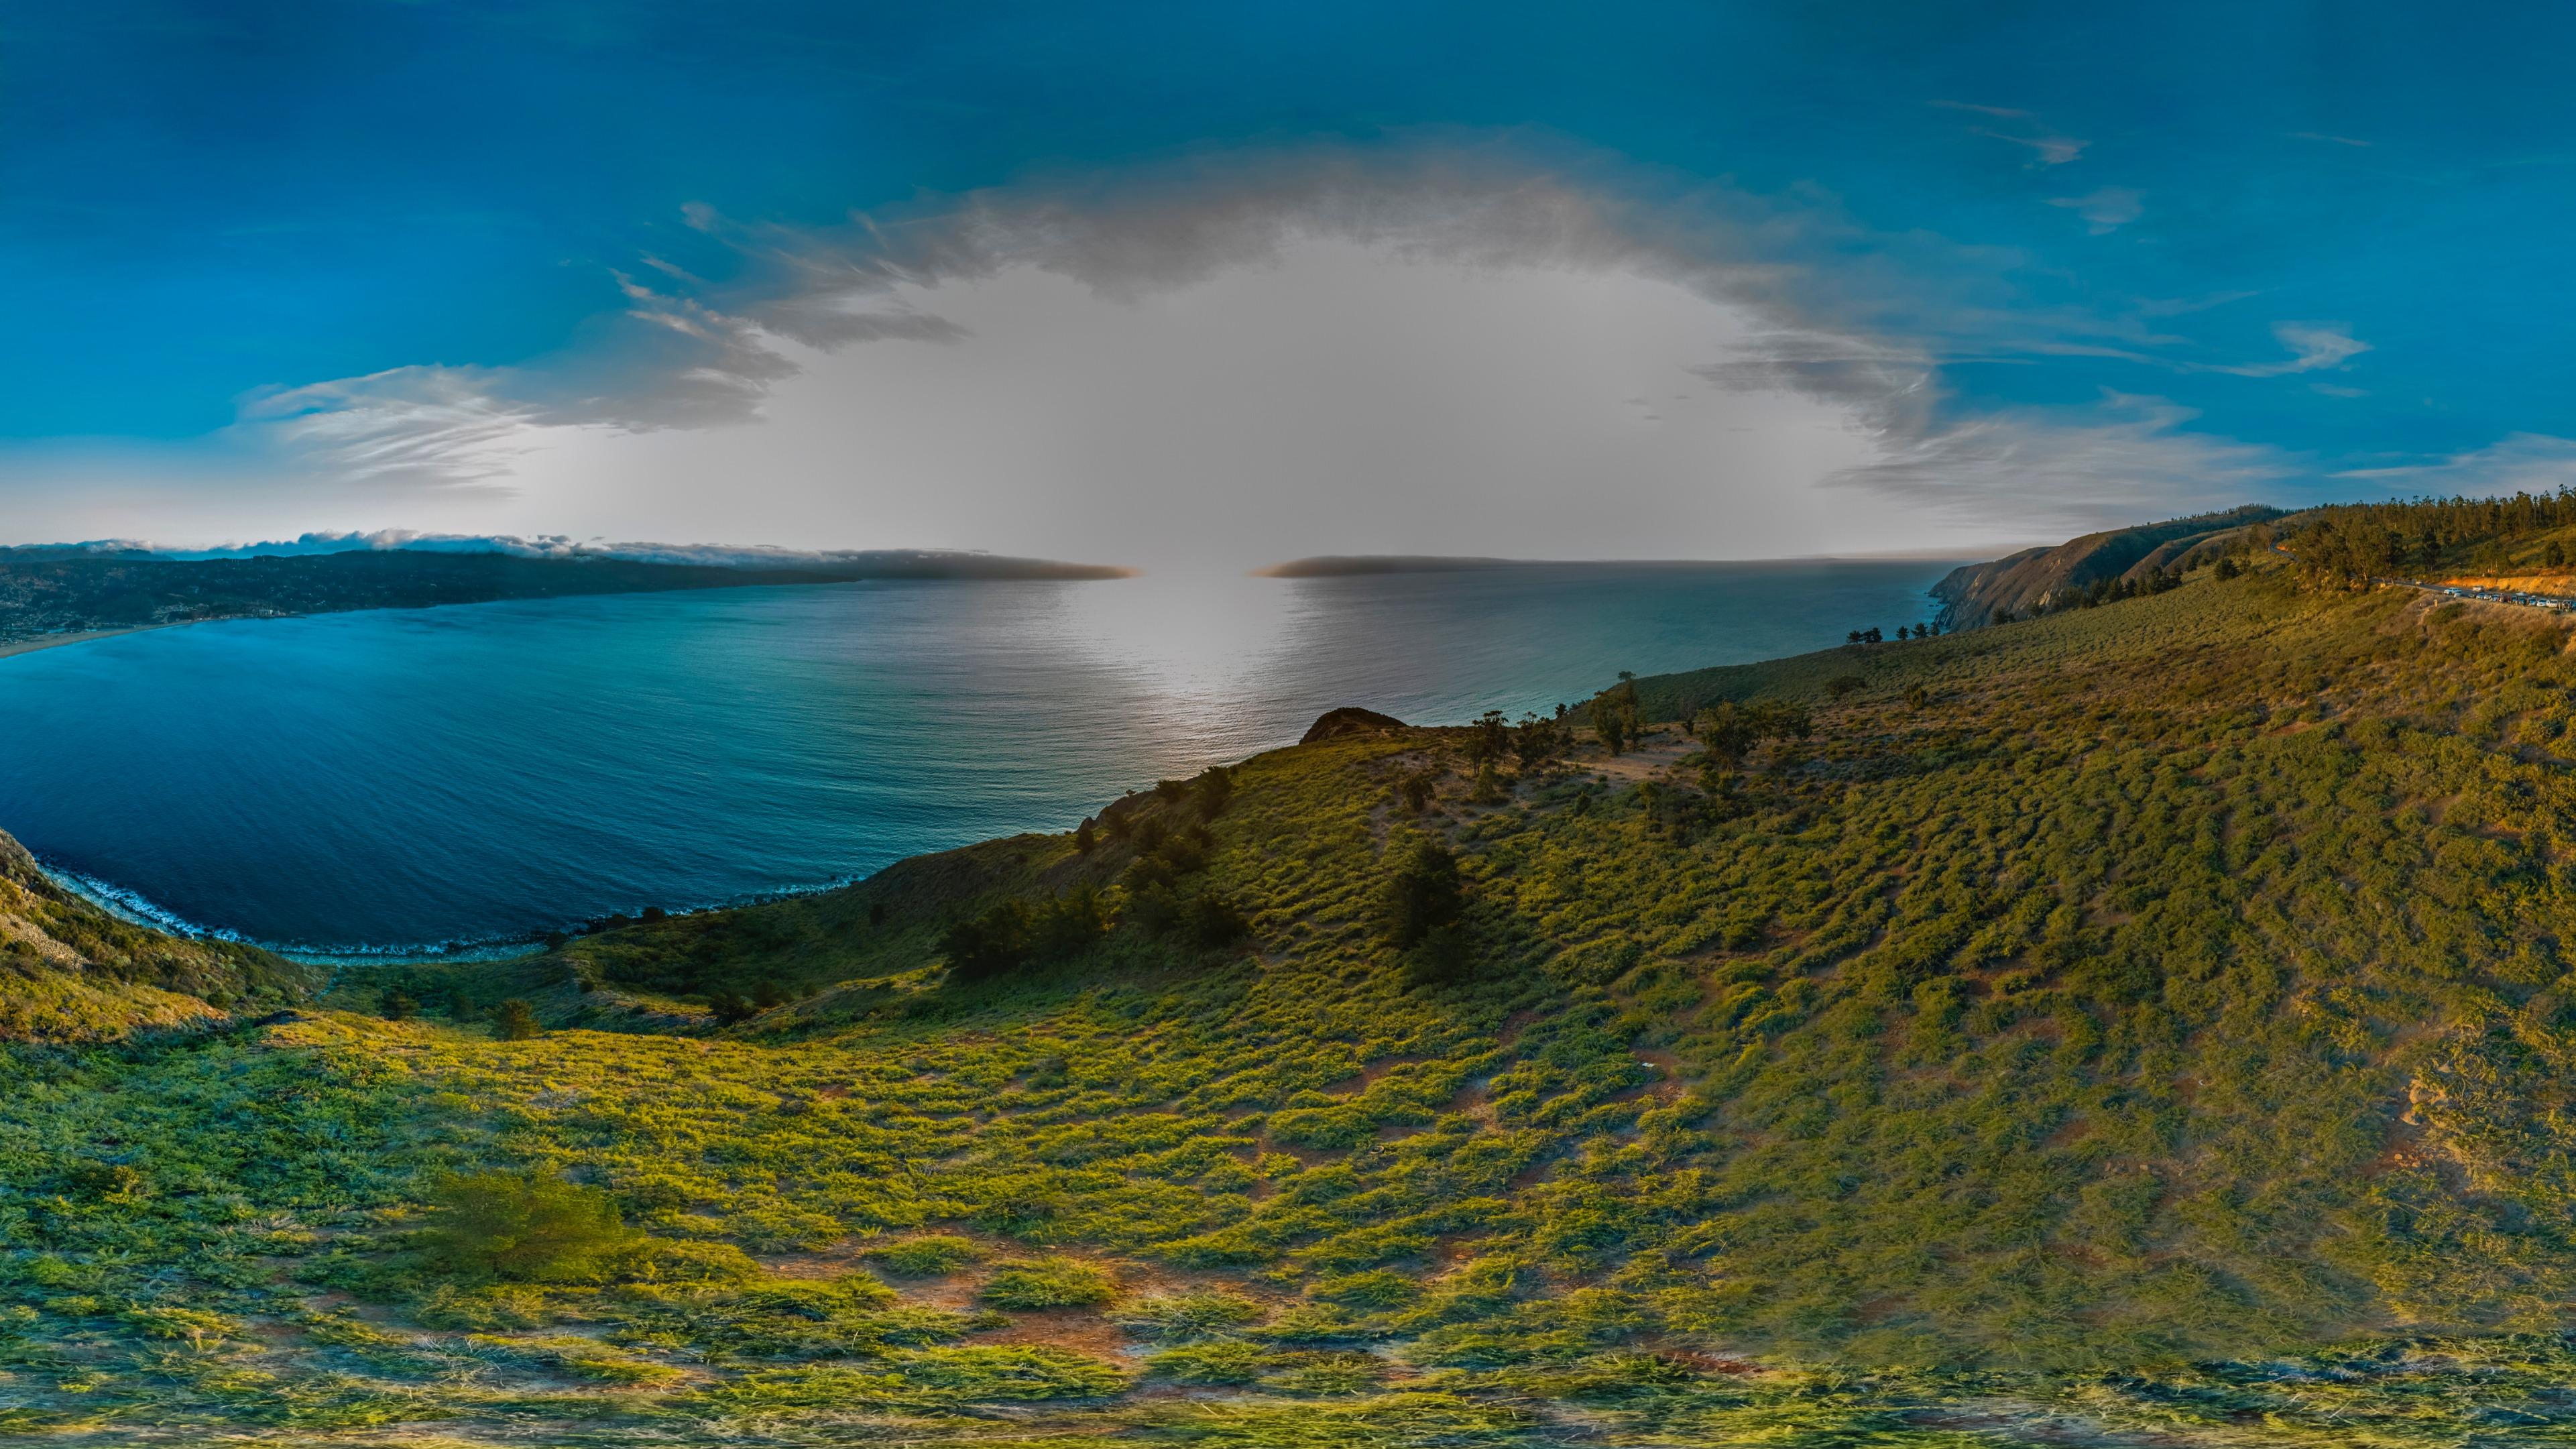 Mirador Laguna Verde